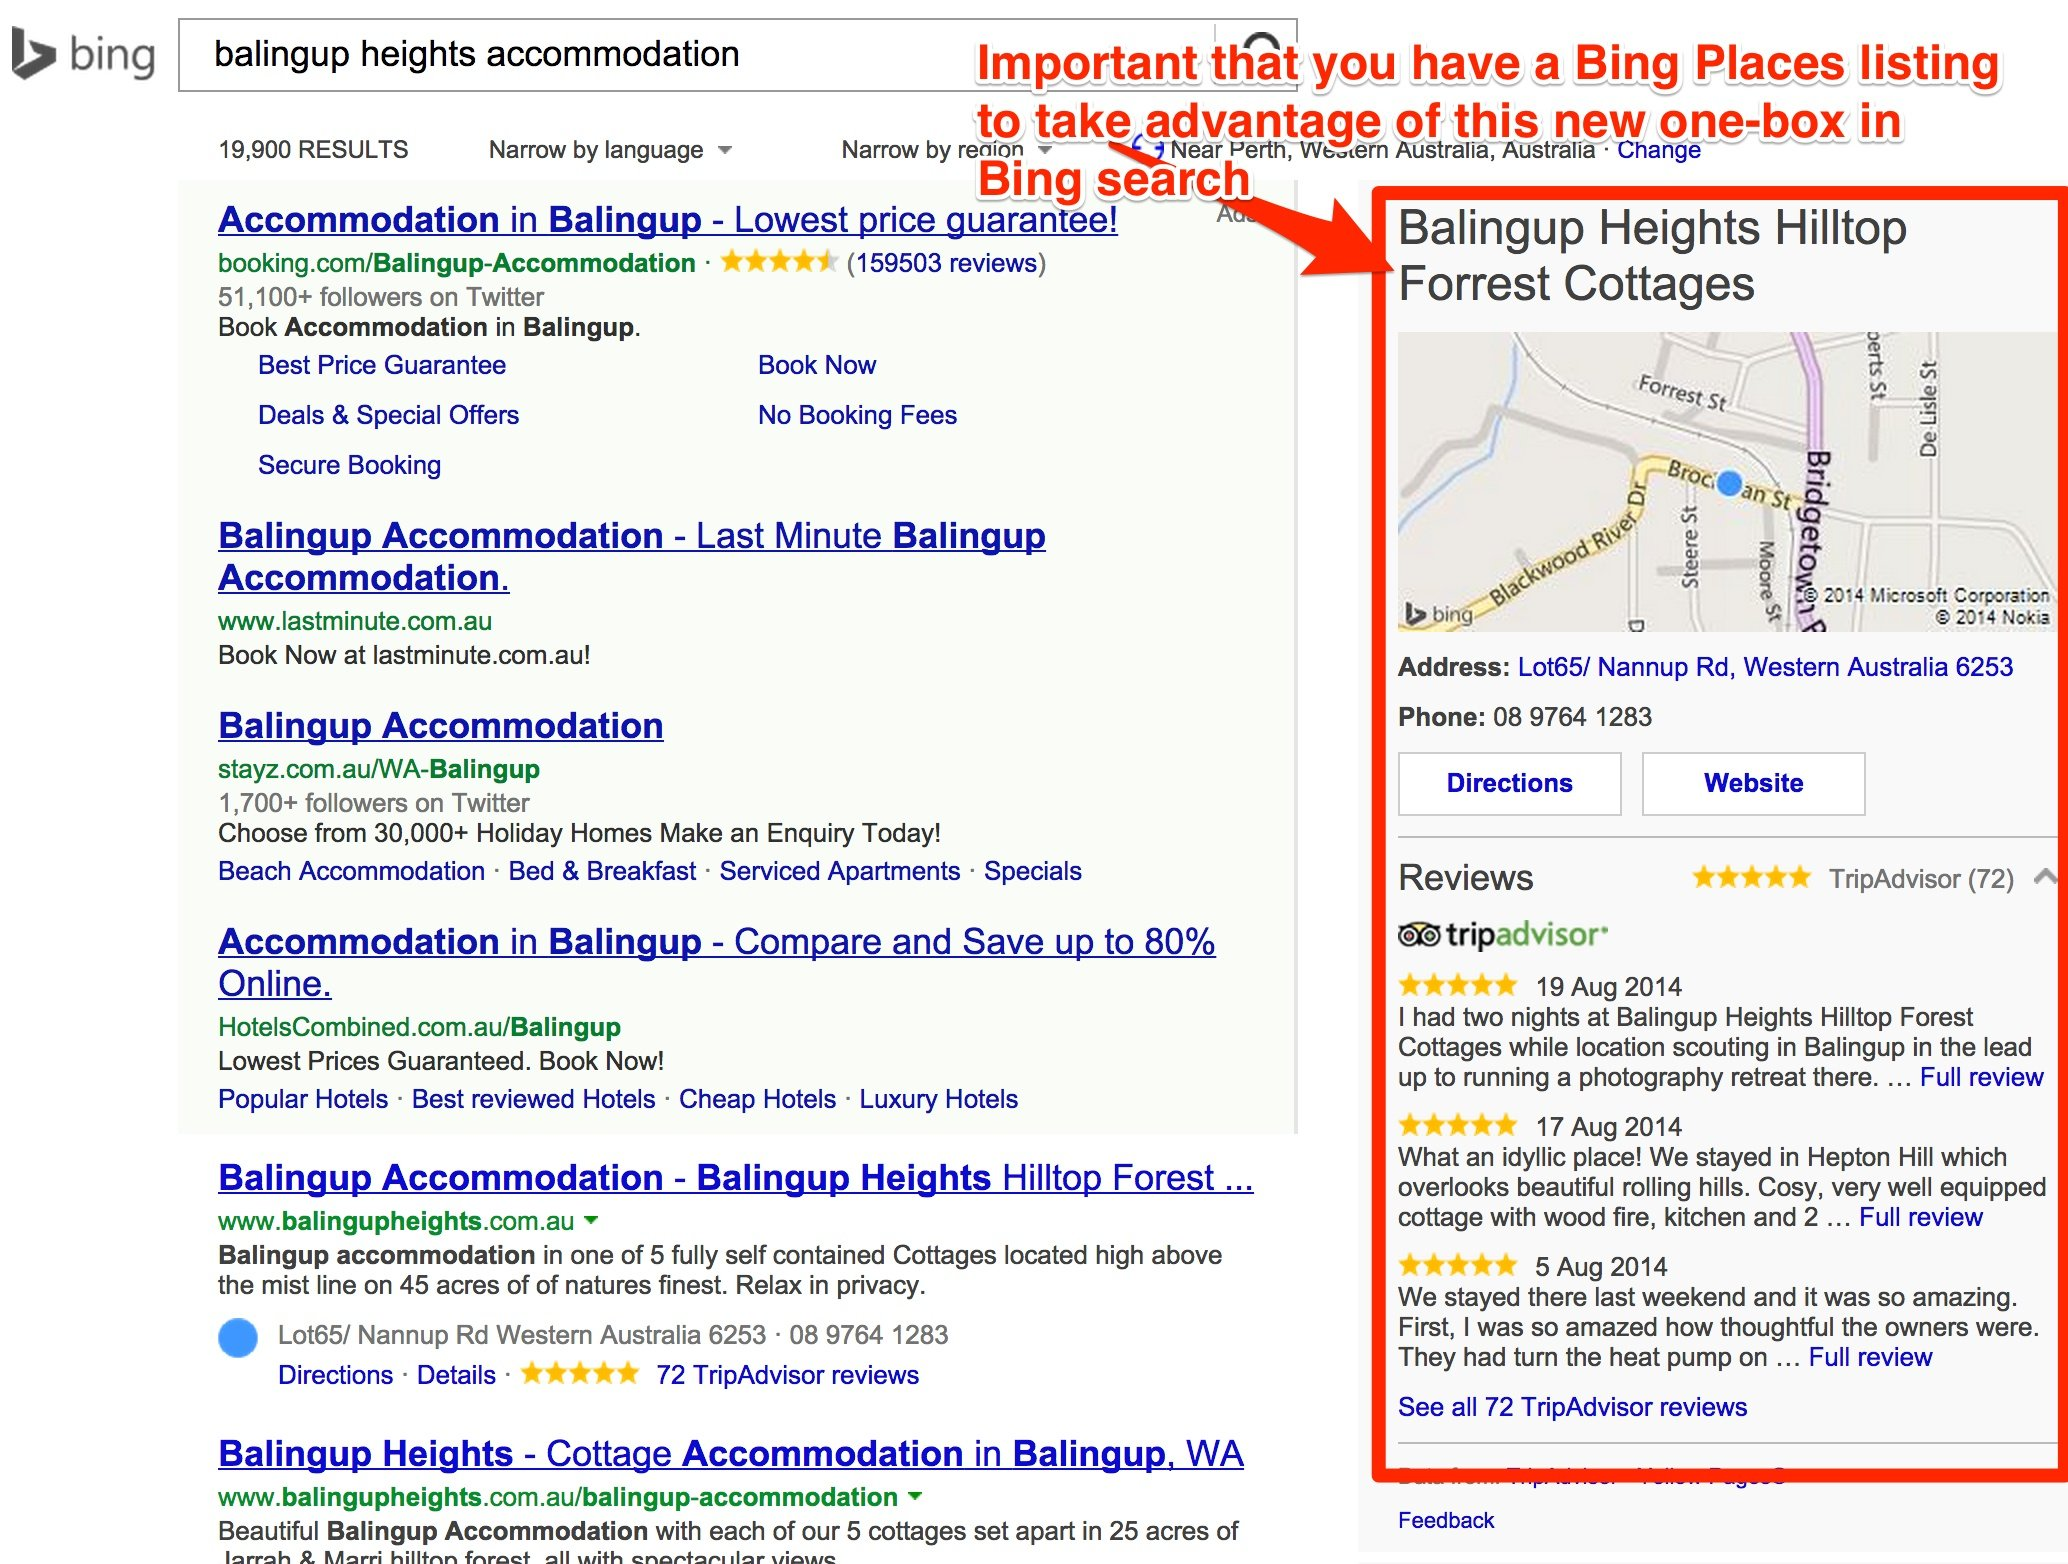 Microsoft Bing search now has a